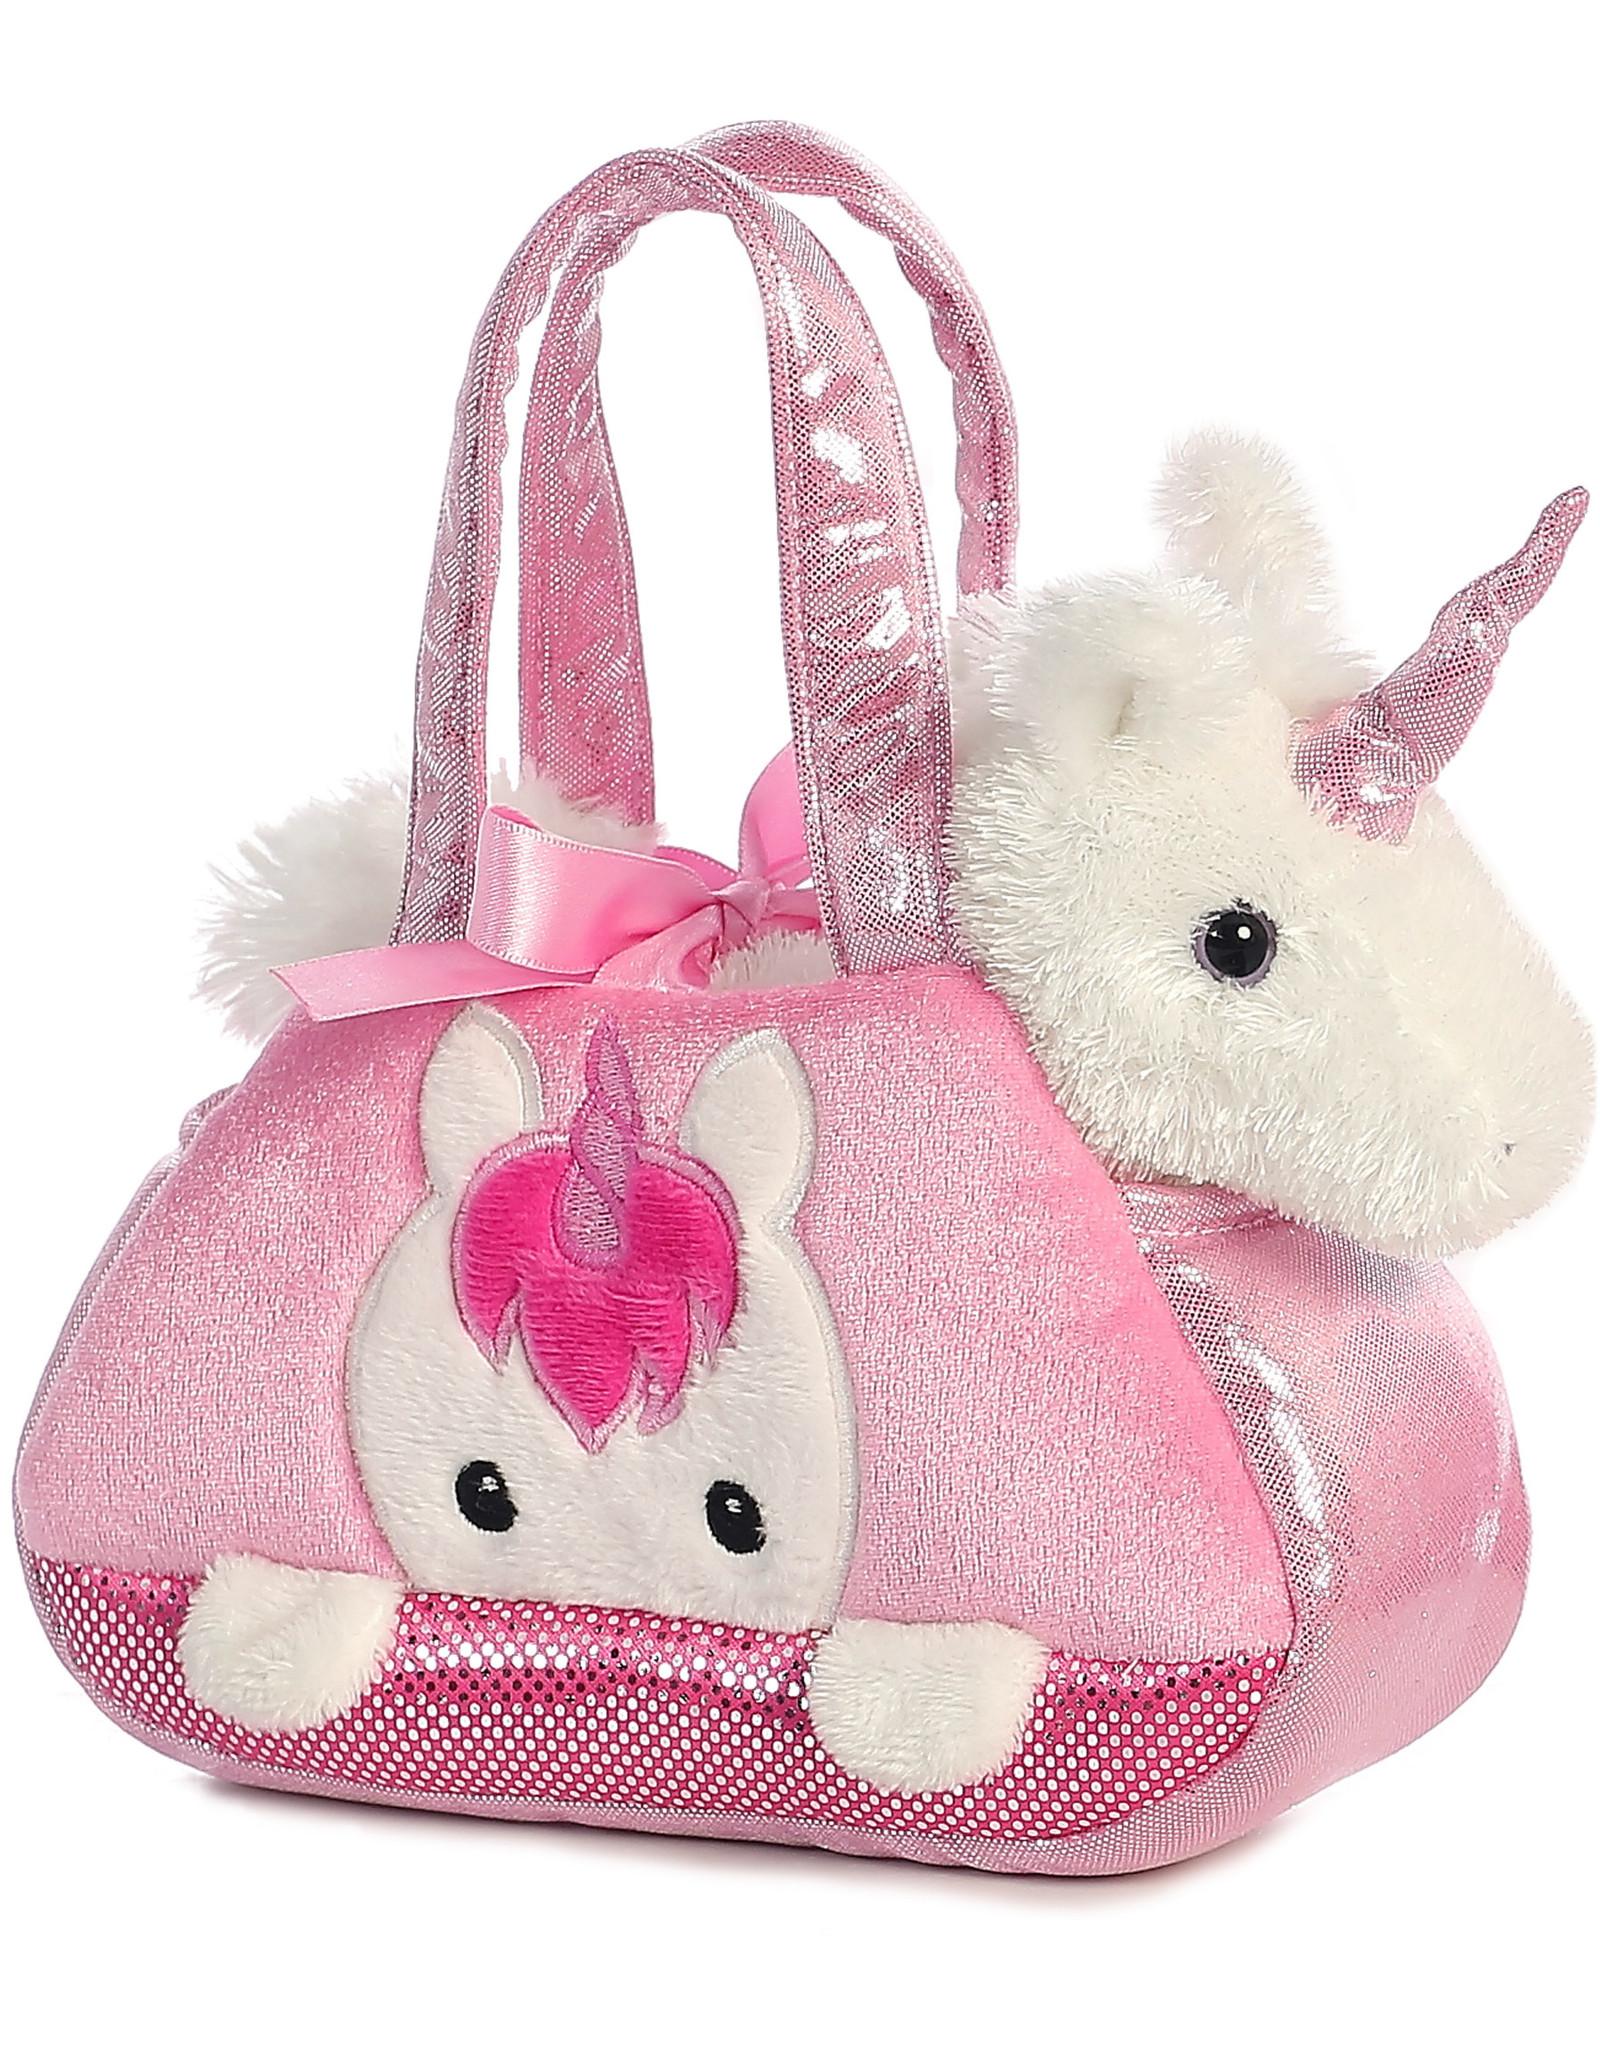 La Licornerie Pink Handbag with Unicorn Plush